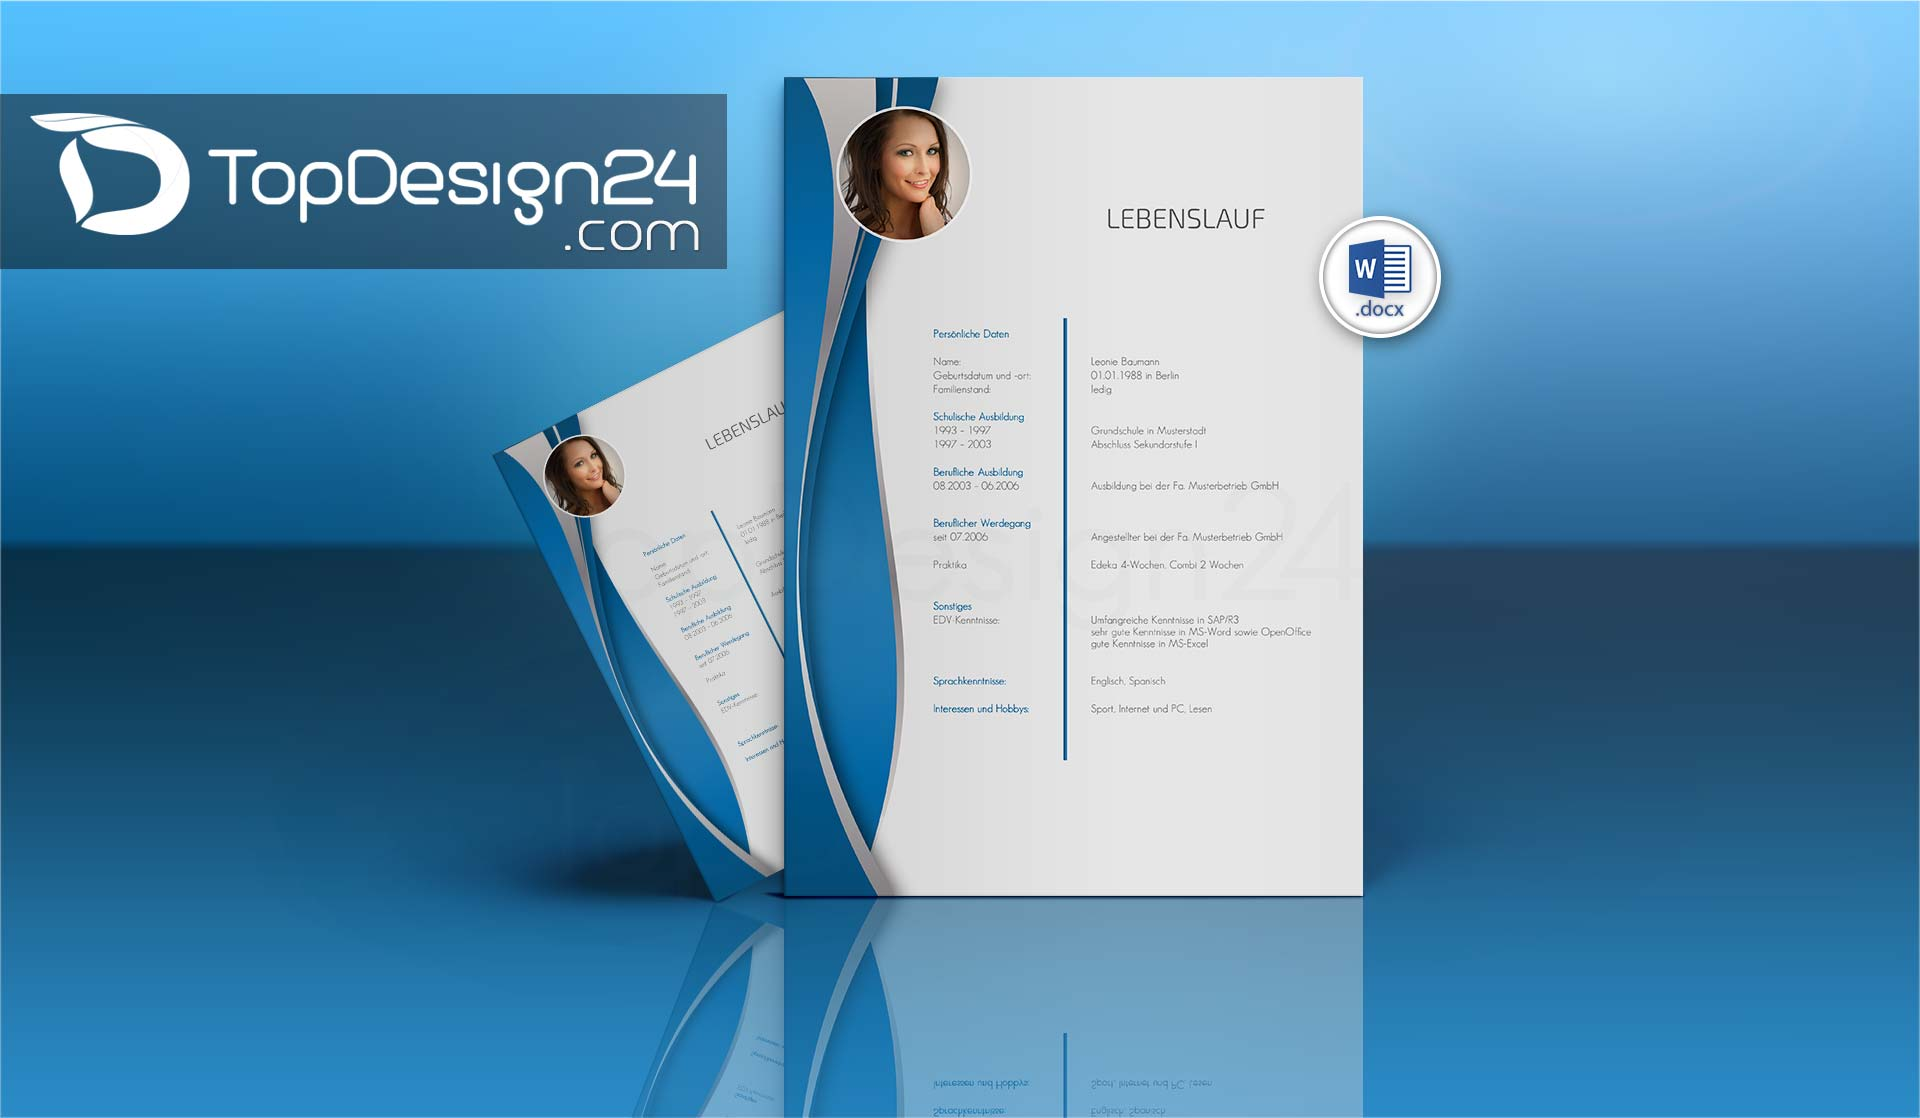 Deckblatt Bewerbung Download Topdesign24